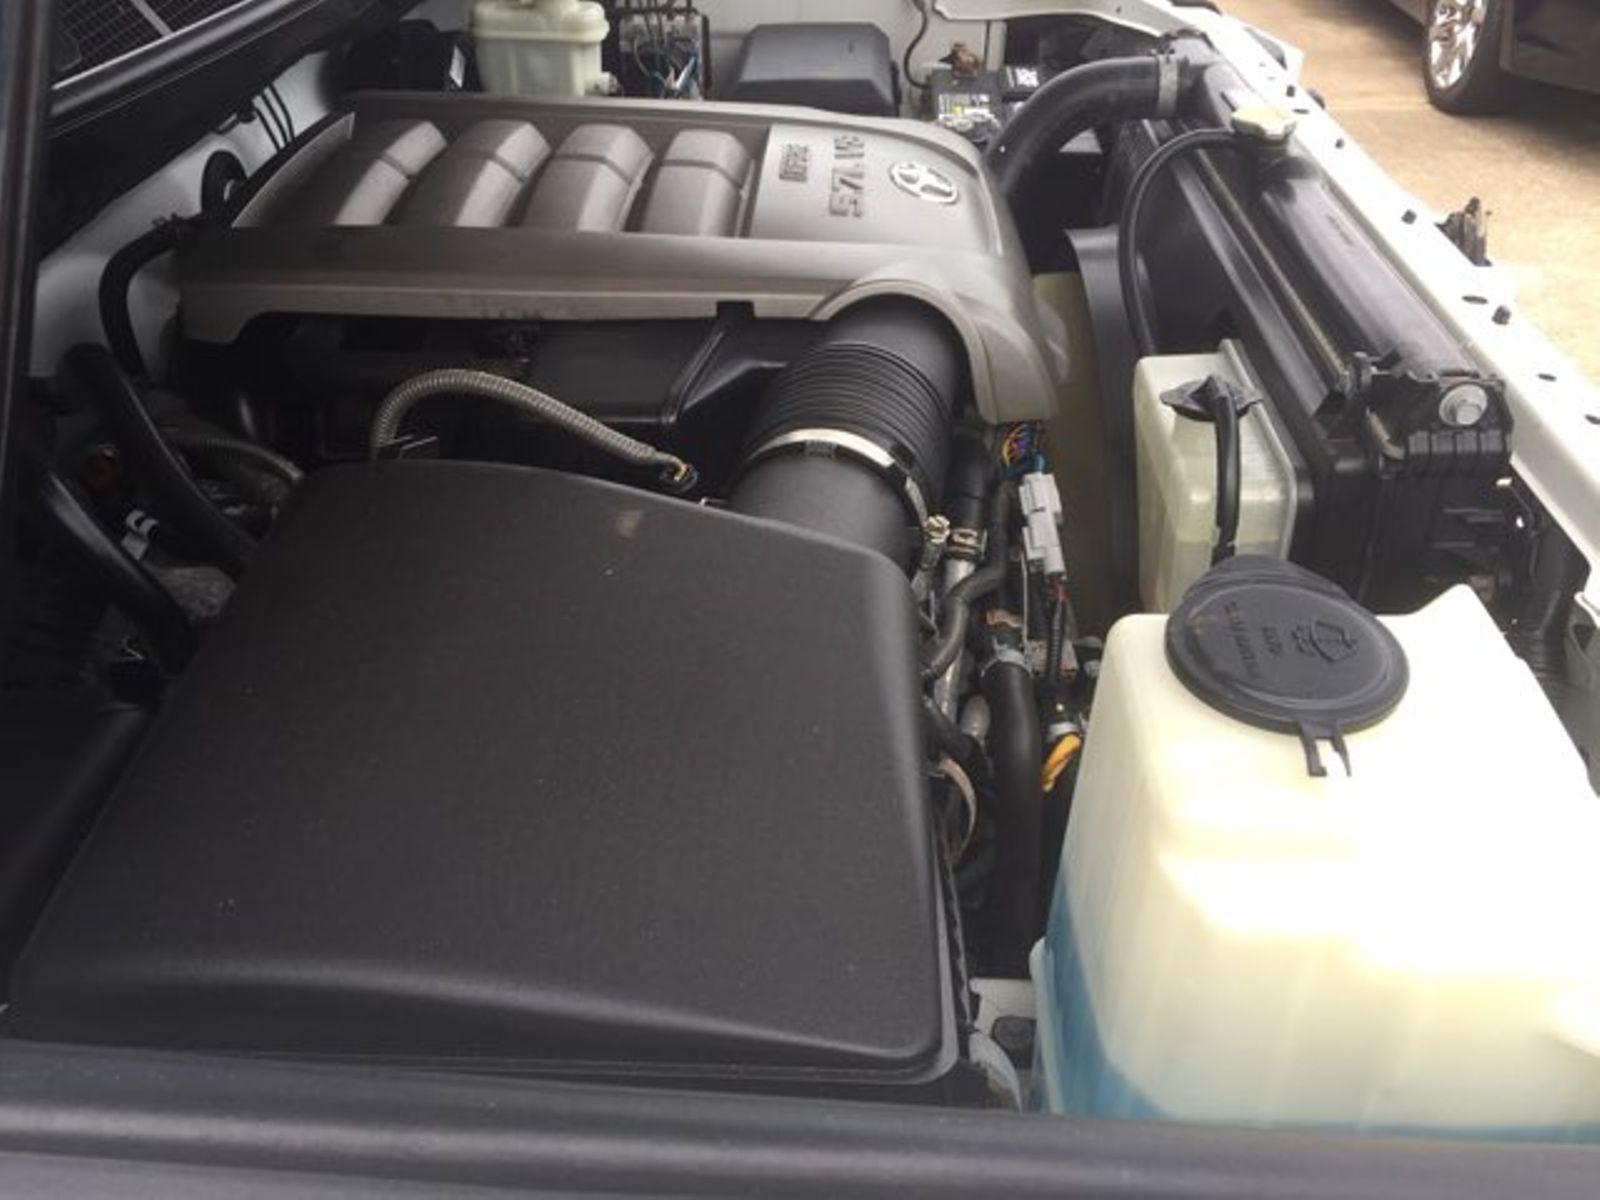 2008 Toyota Tundra Sr5 Transmission Wiring Harness In Bossier City La